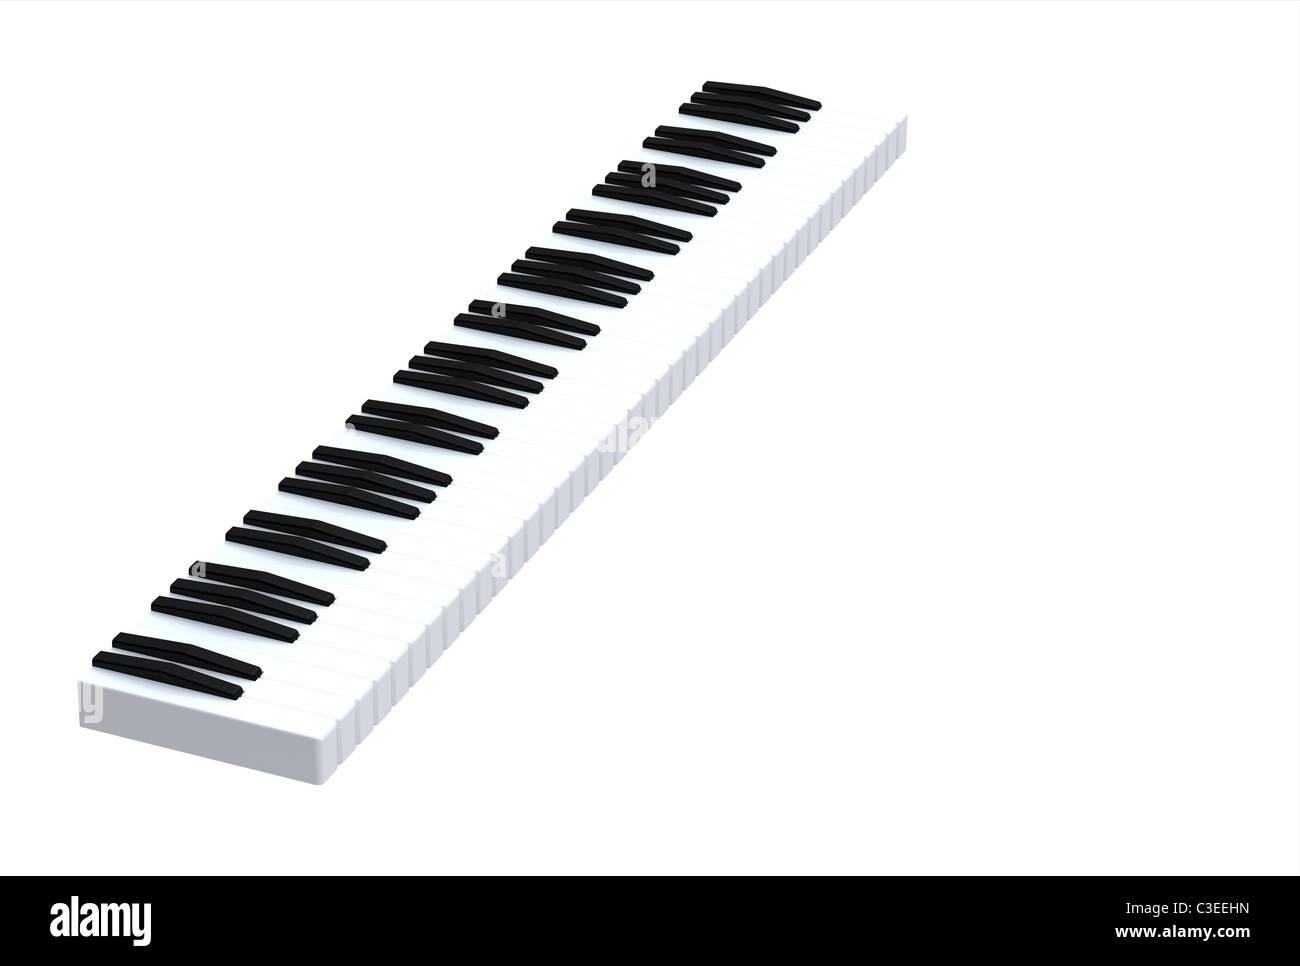 Black and white keys on music keyboard - Stock Image